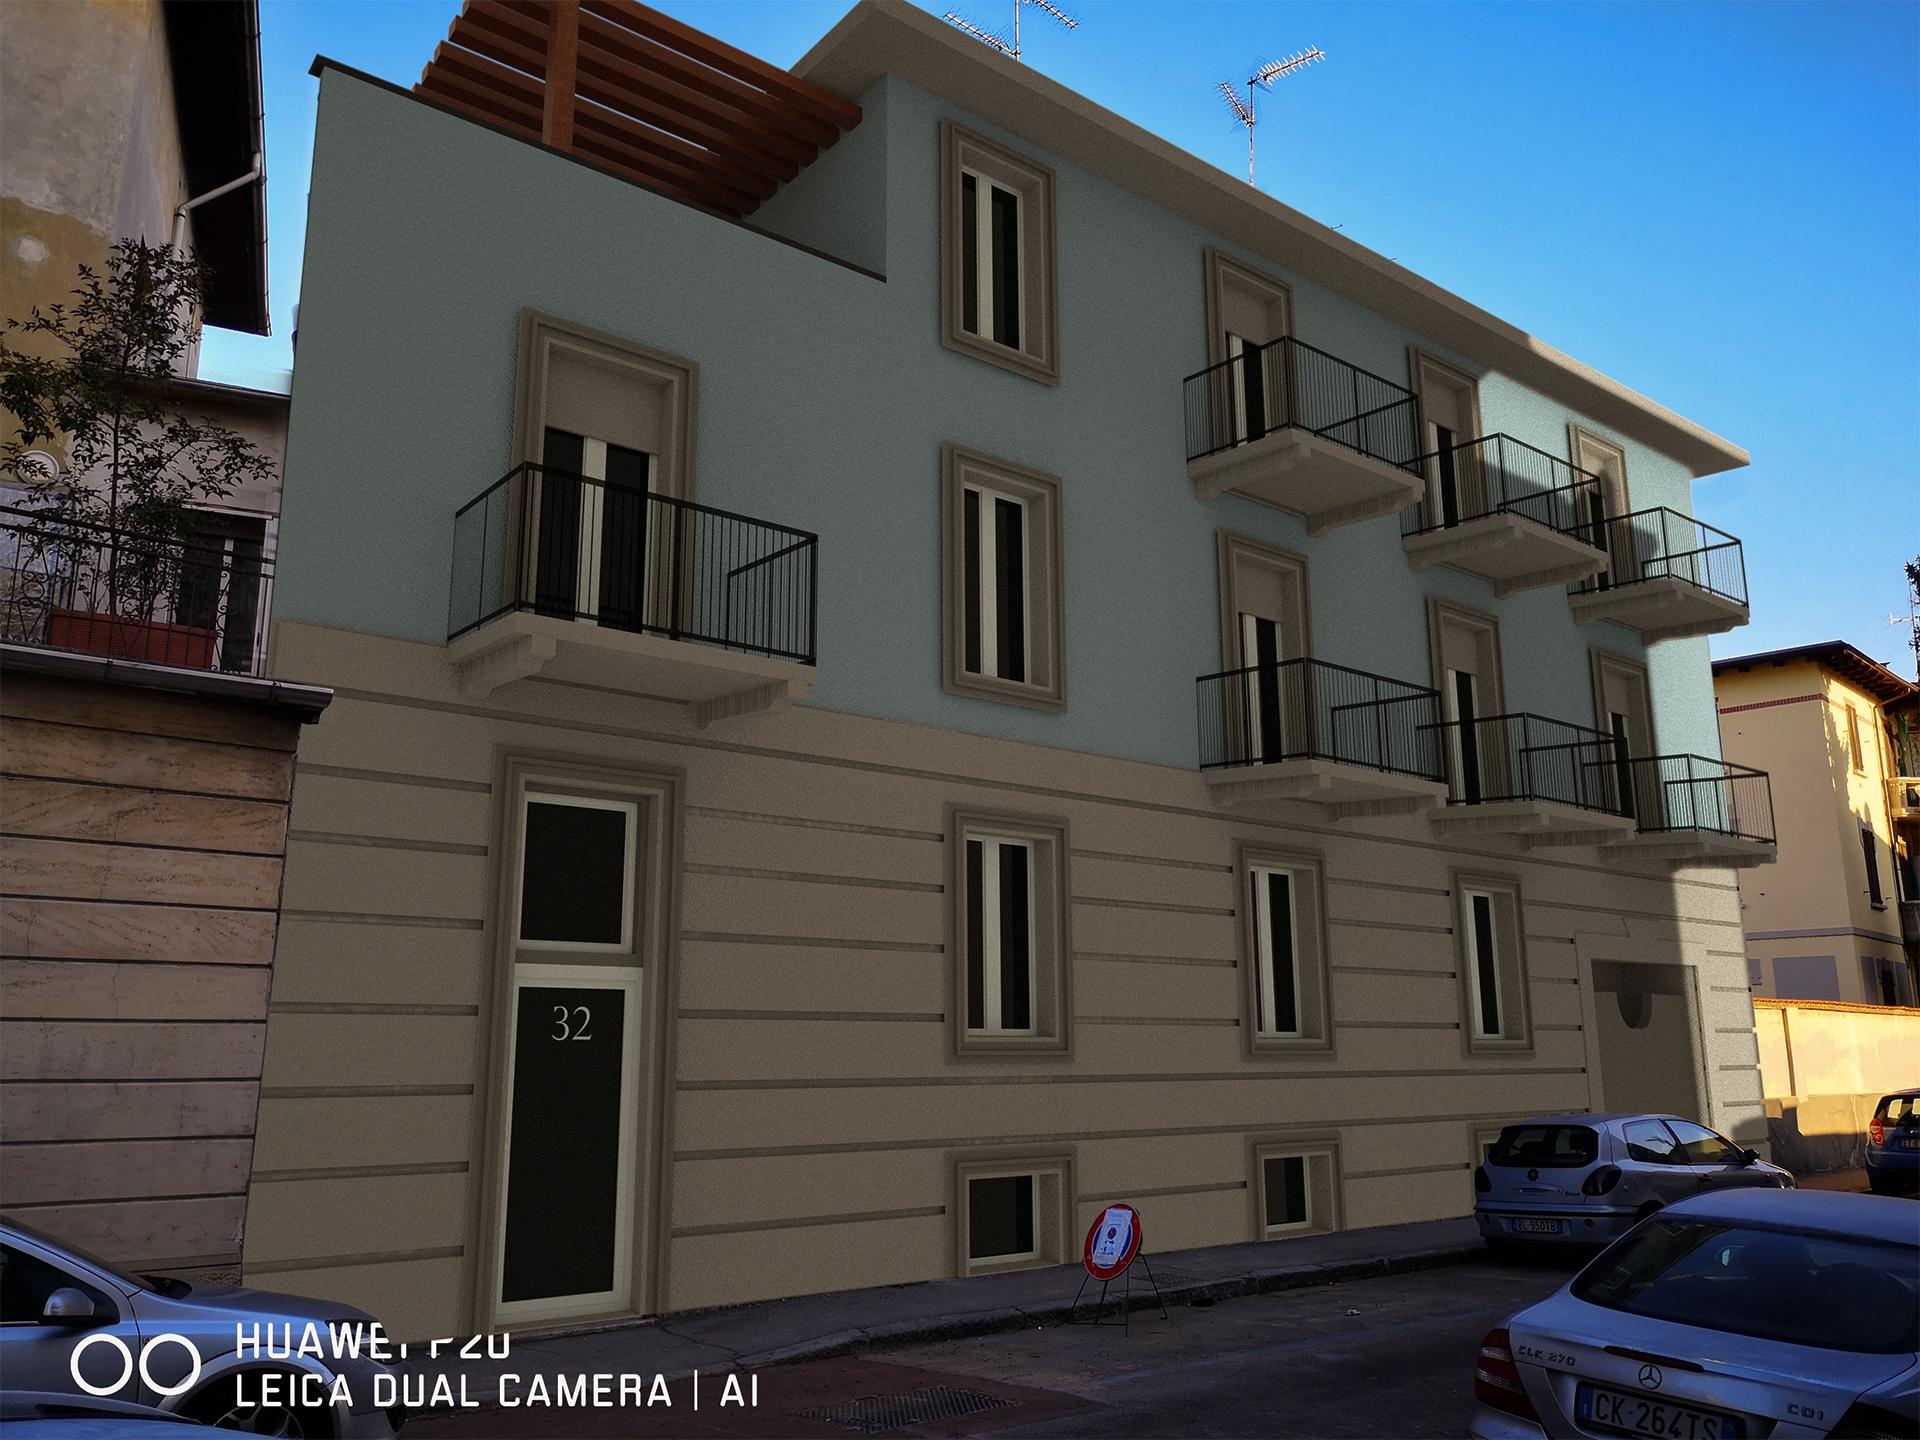 Palazzo Novara con Fotoinserimento